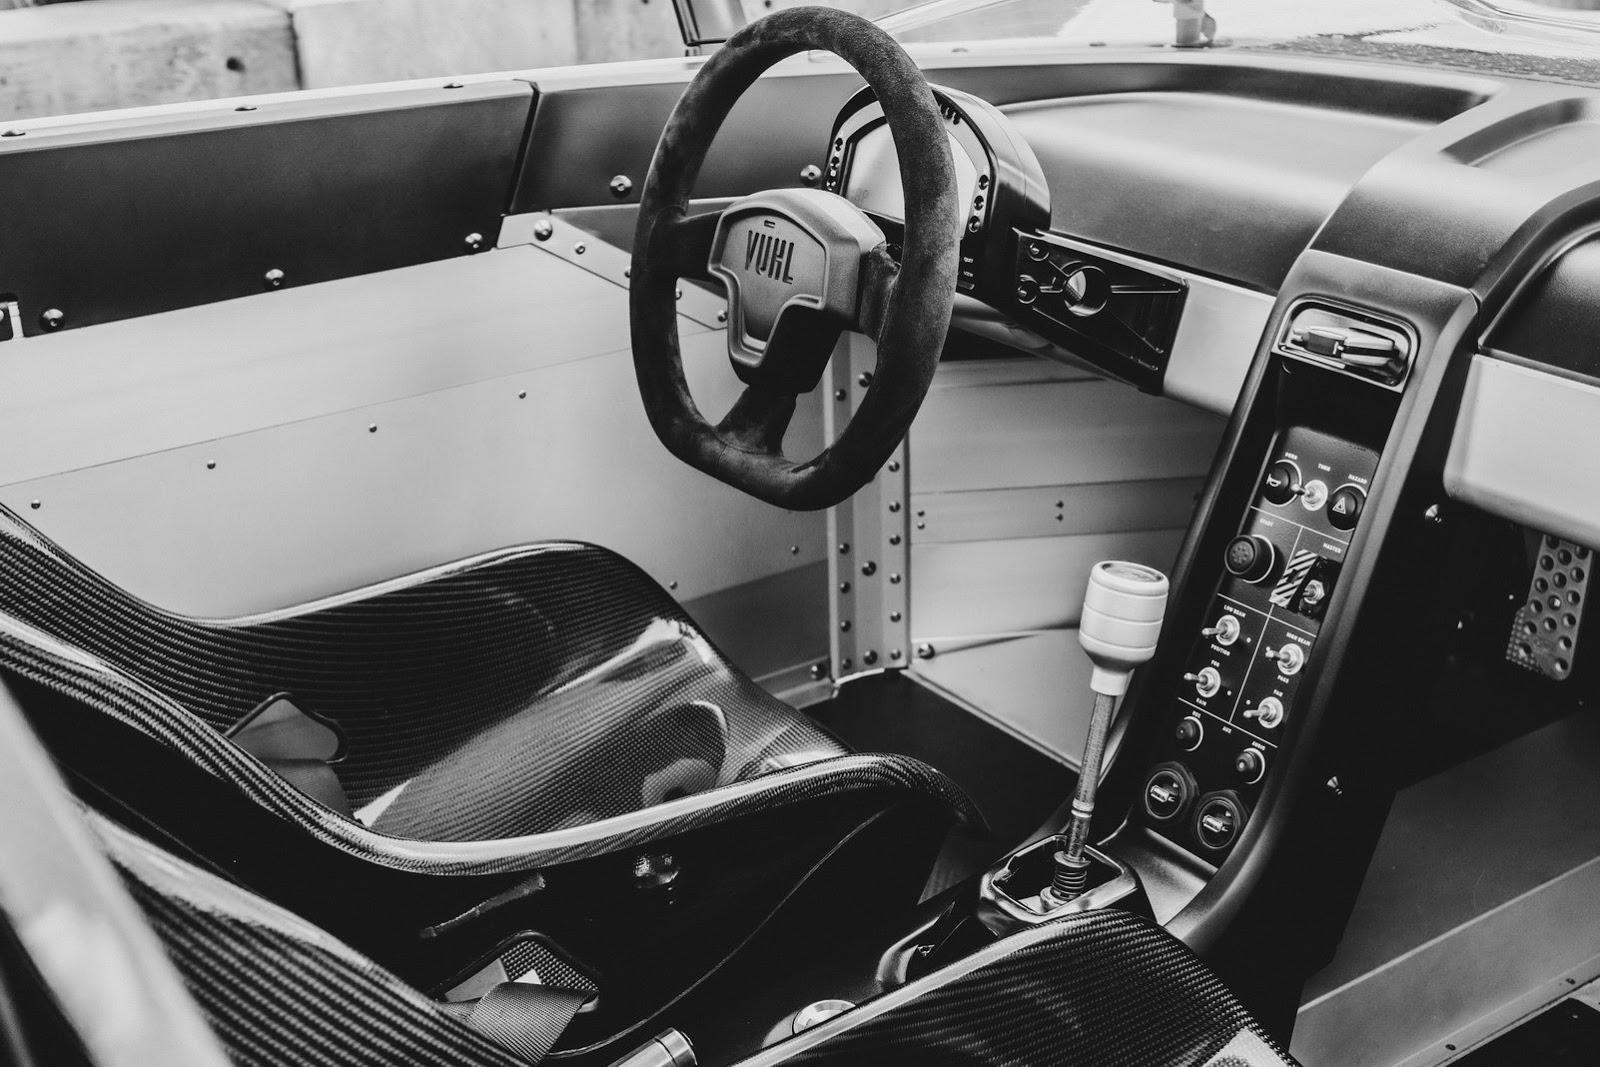 Vuhl 05 Details Revealed Autoevolution